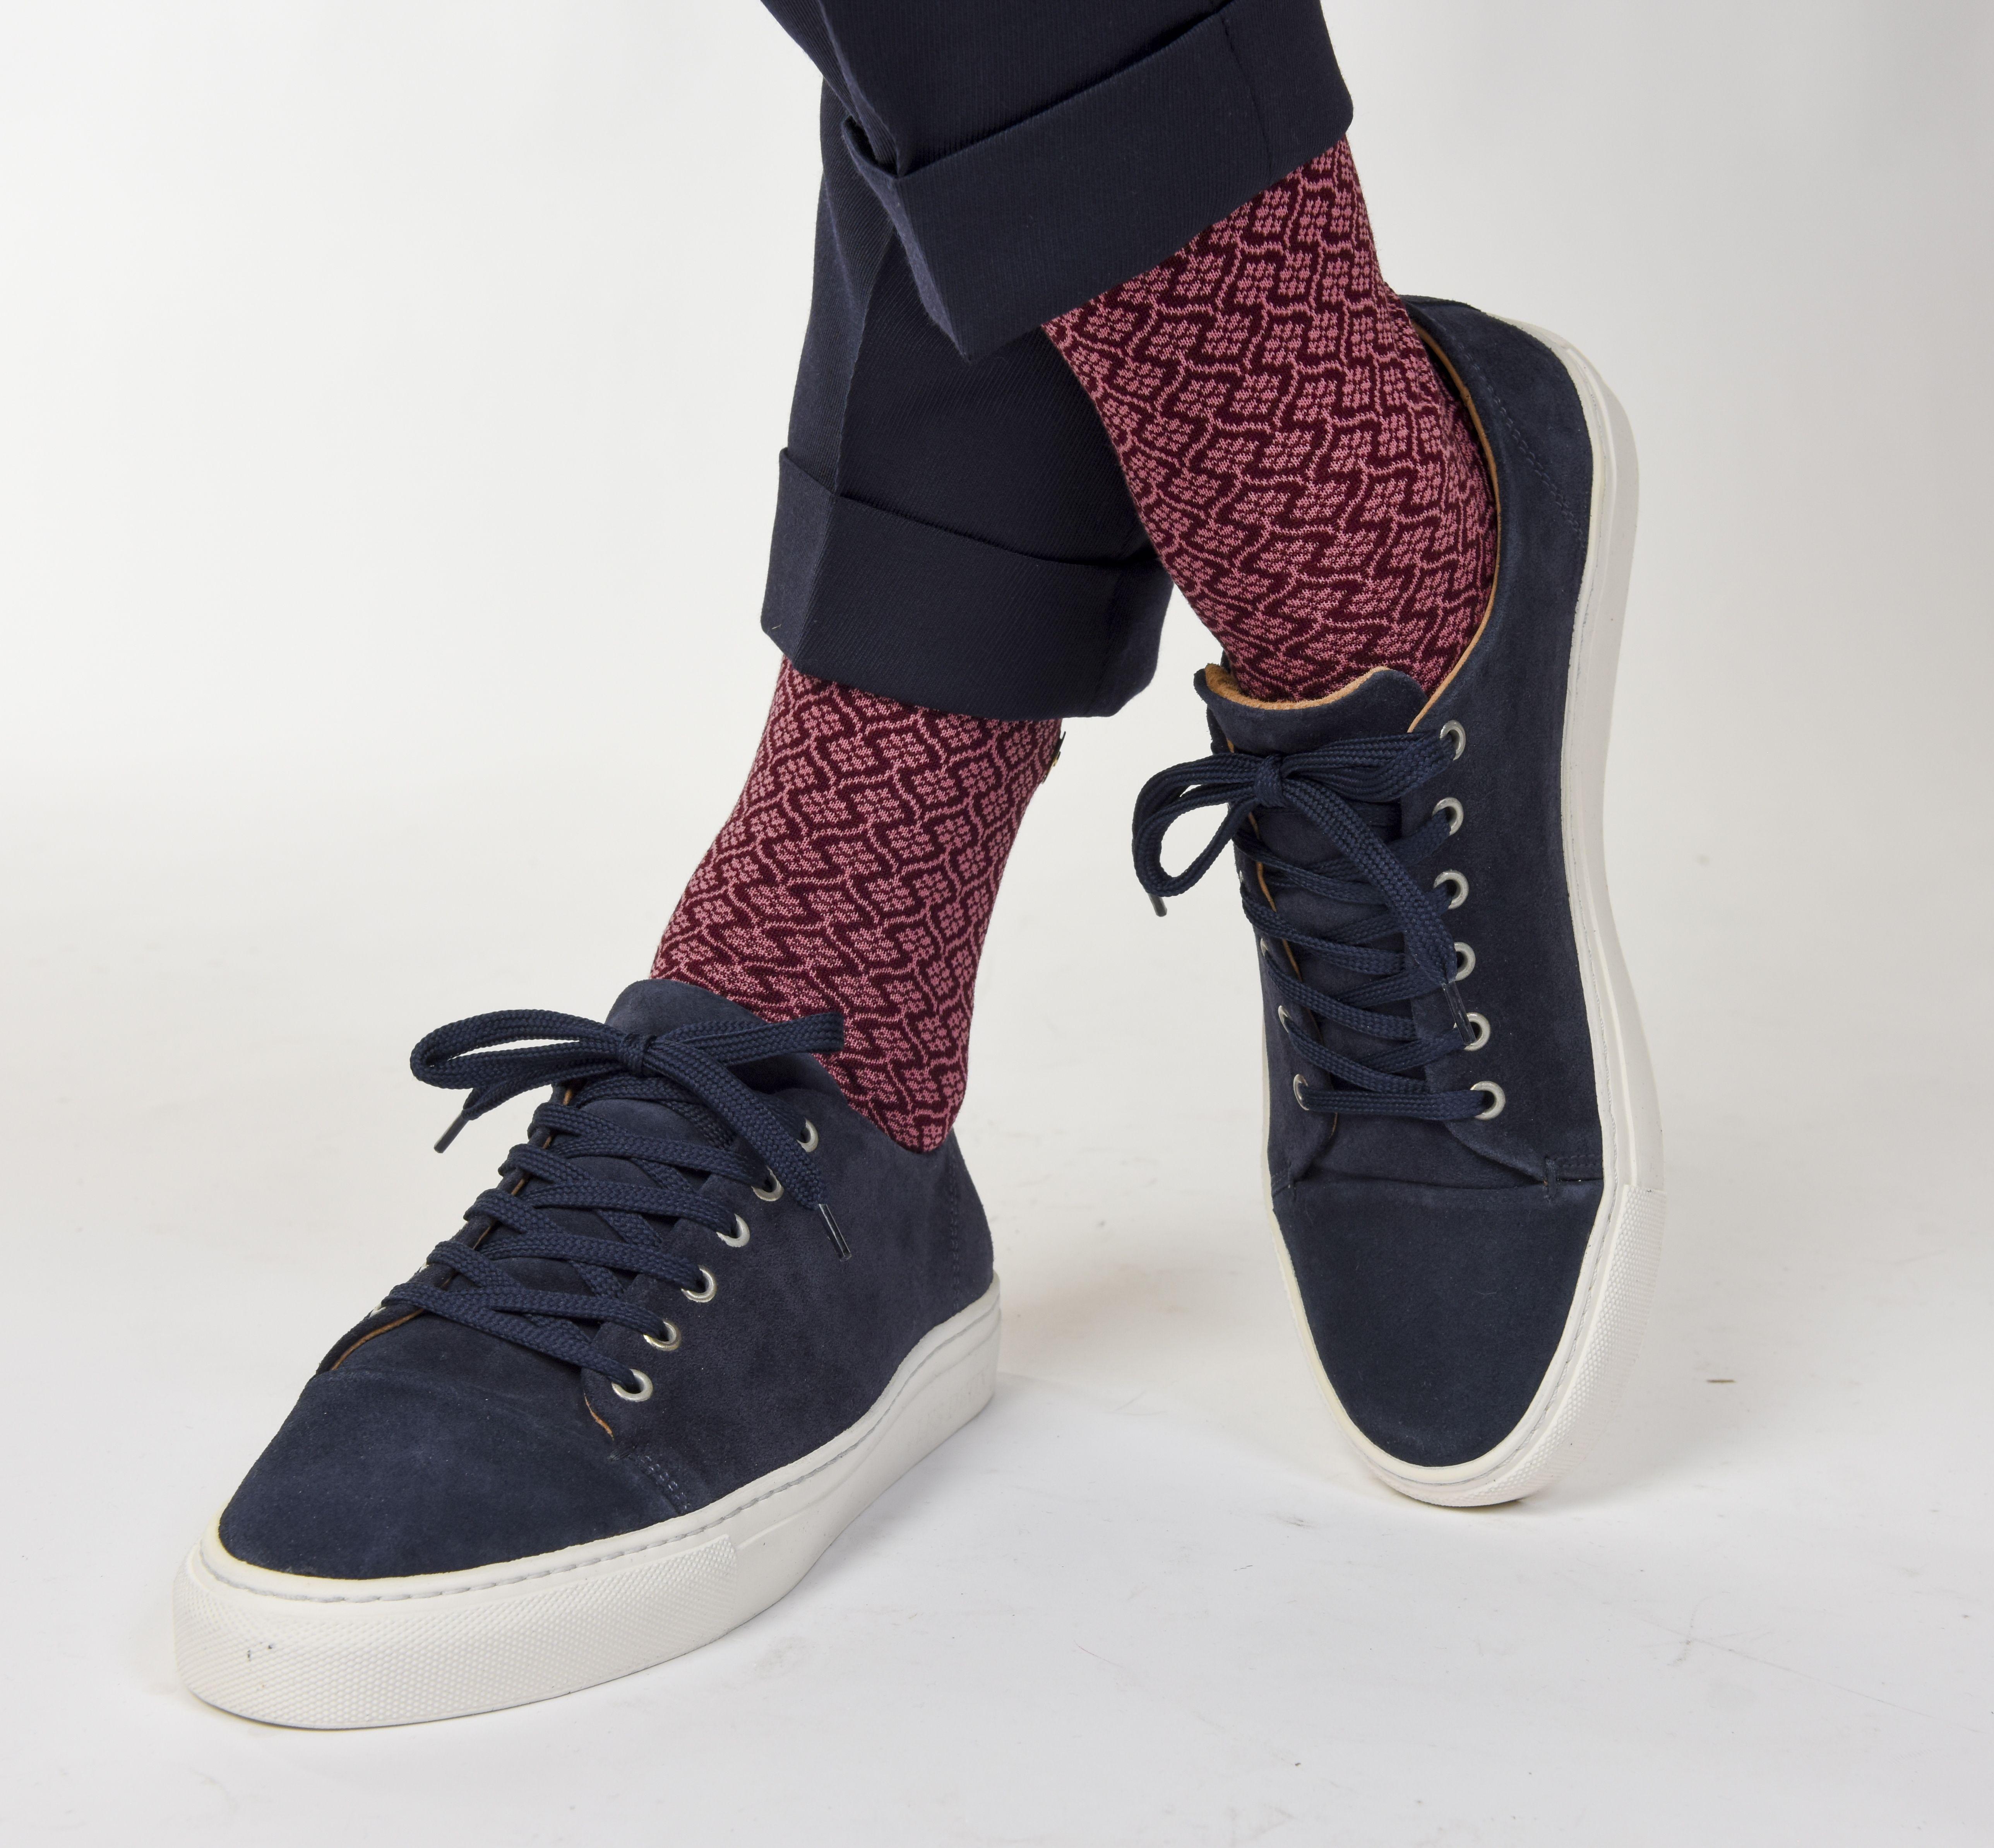 pretty nice ce8a3 3eaeb Designed socks for the stylish gentleman!